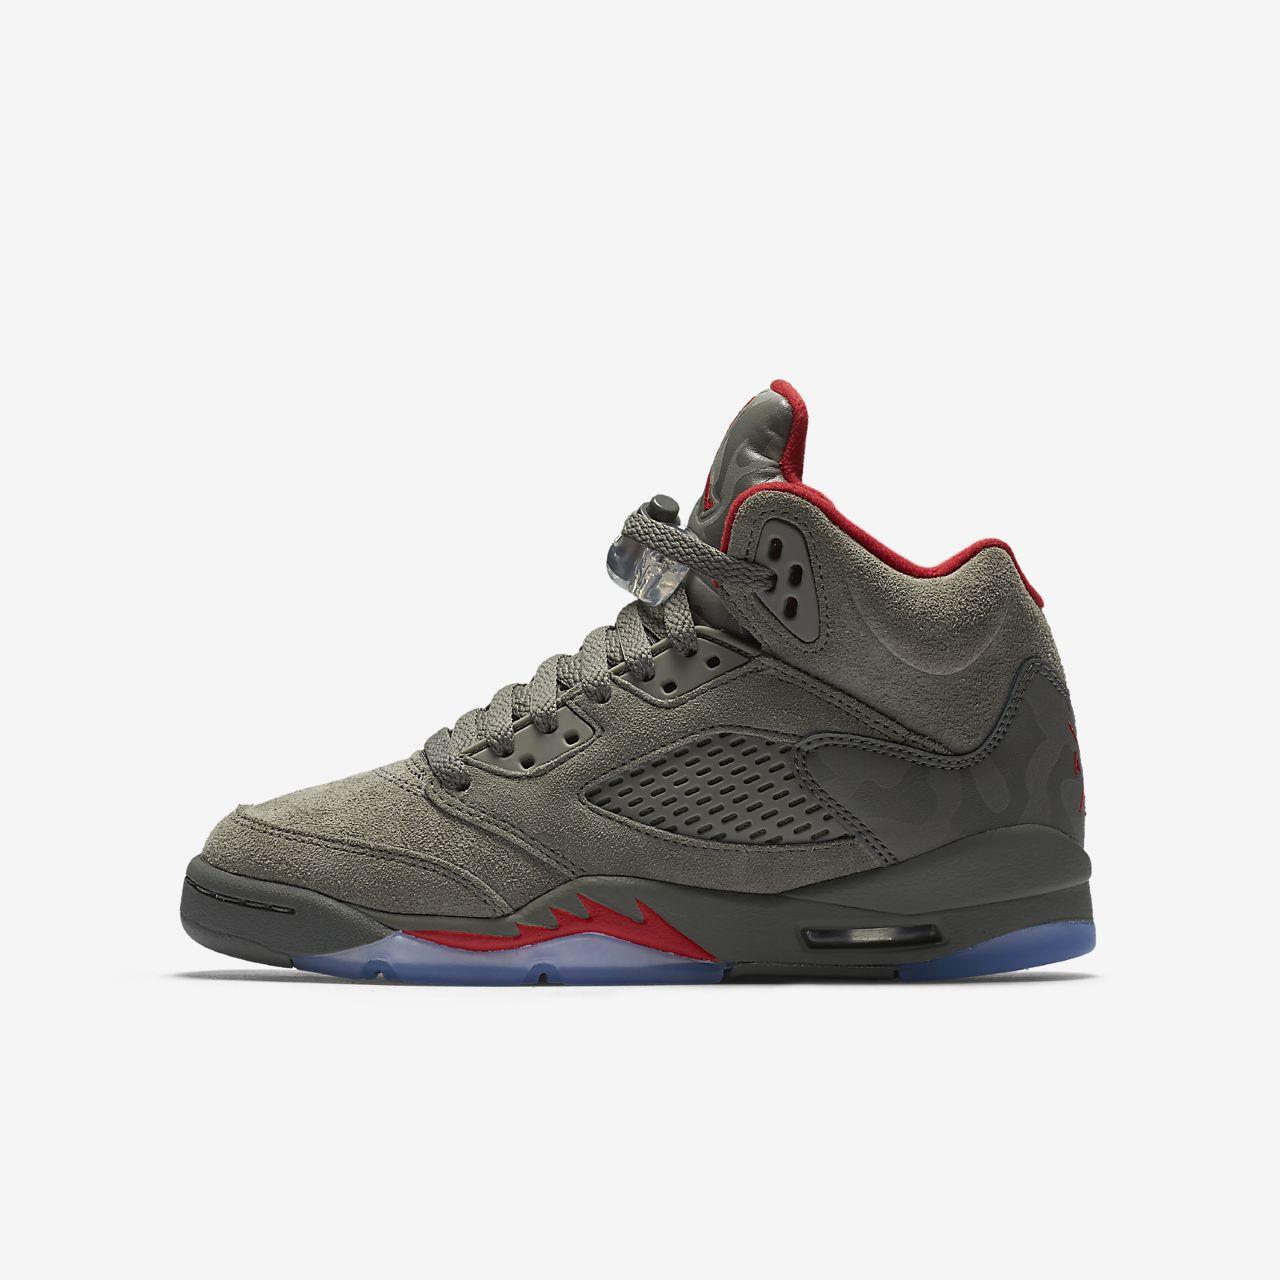 5bbdf5b0851 ... australia calzado para niños talla grande air jordan 5 retro 225 25 cm  b01ea c5e19